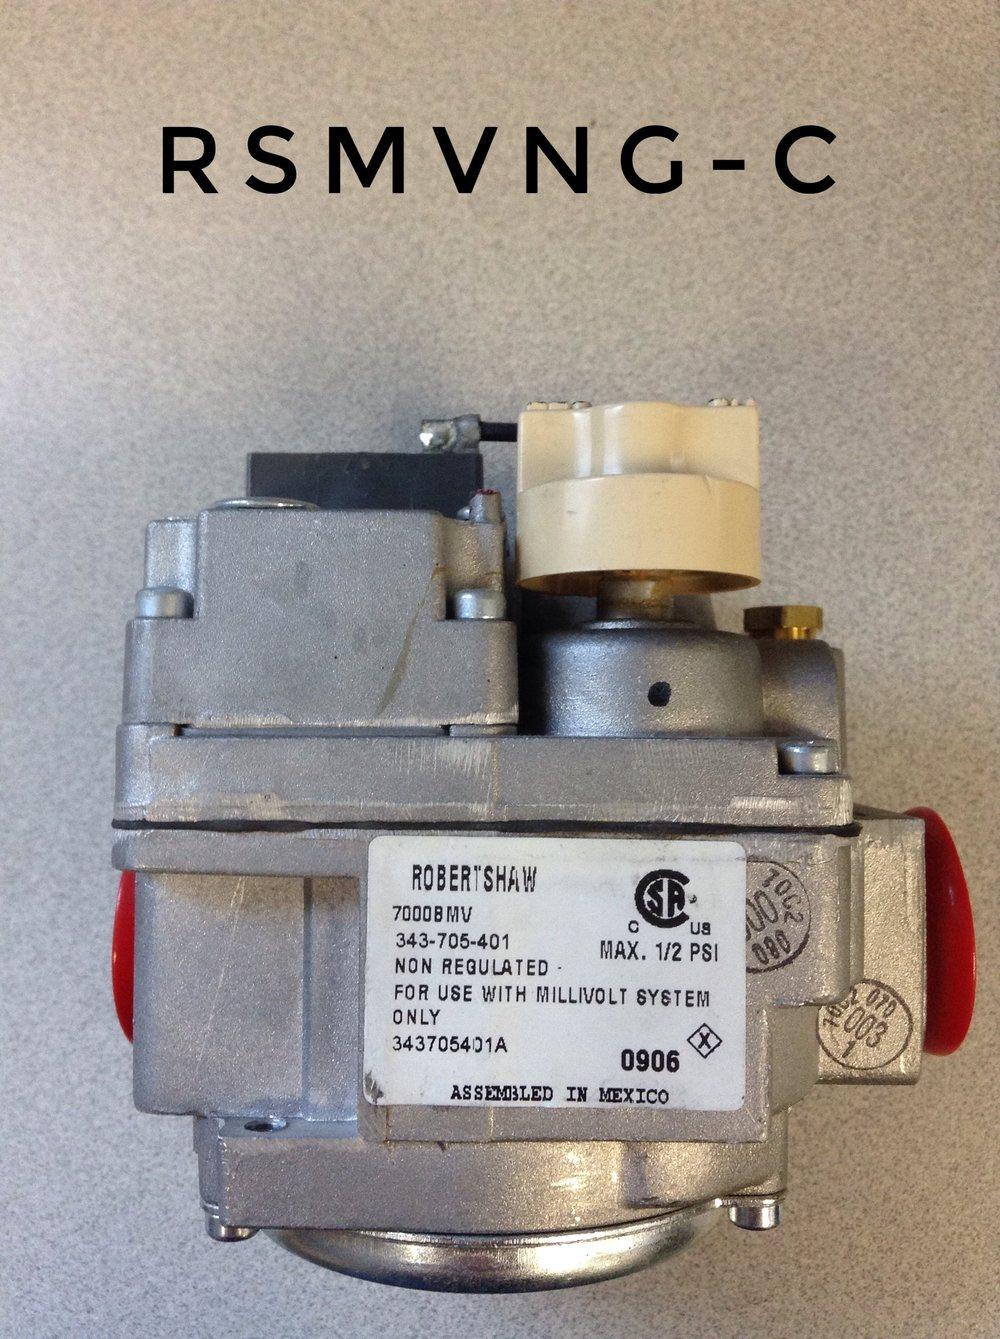 RSMVNG-C (2).JPG